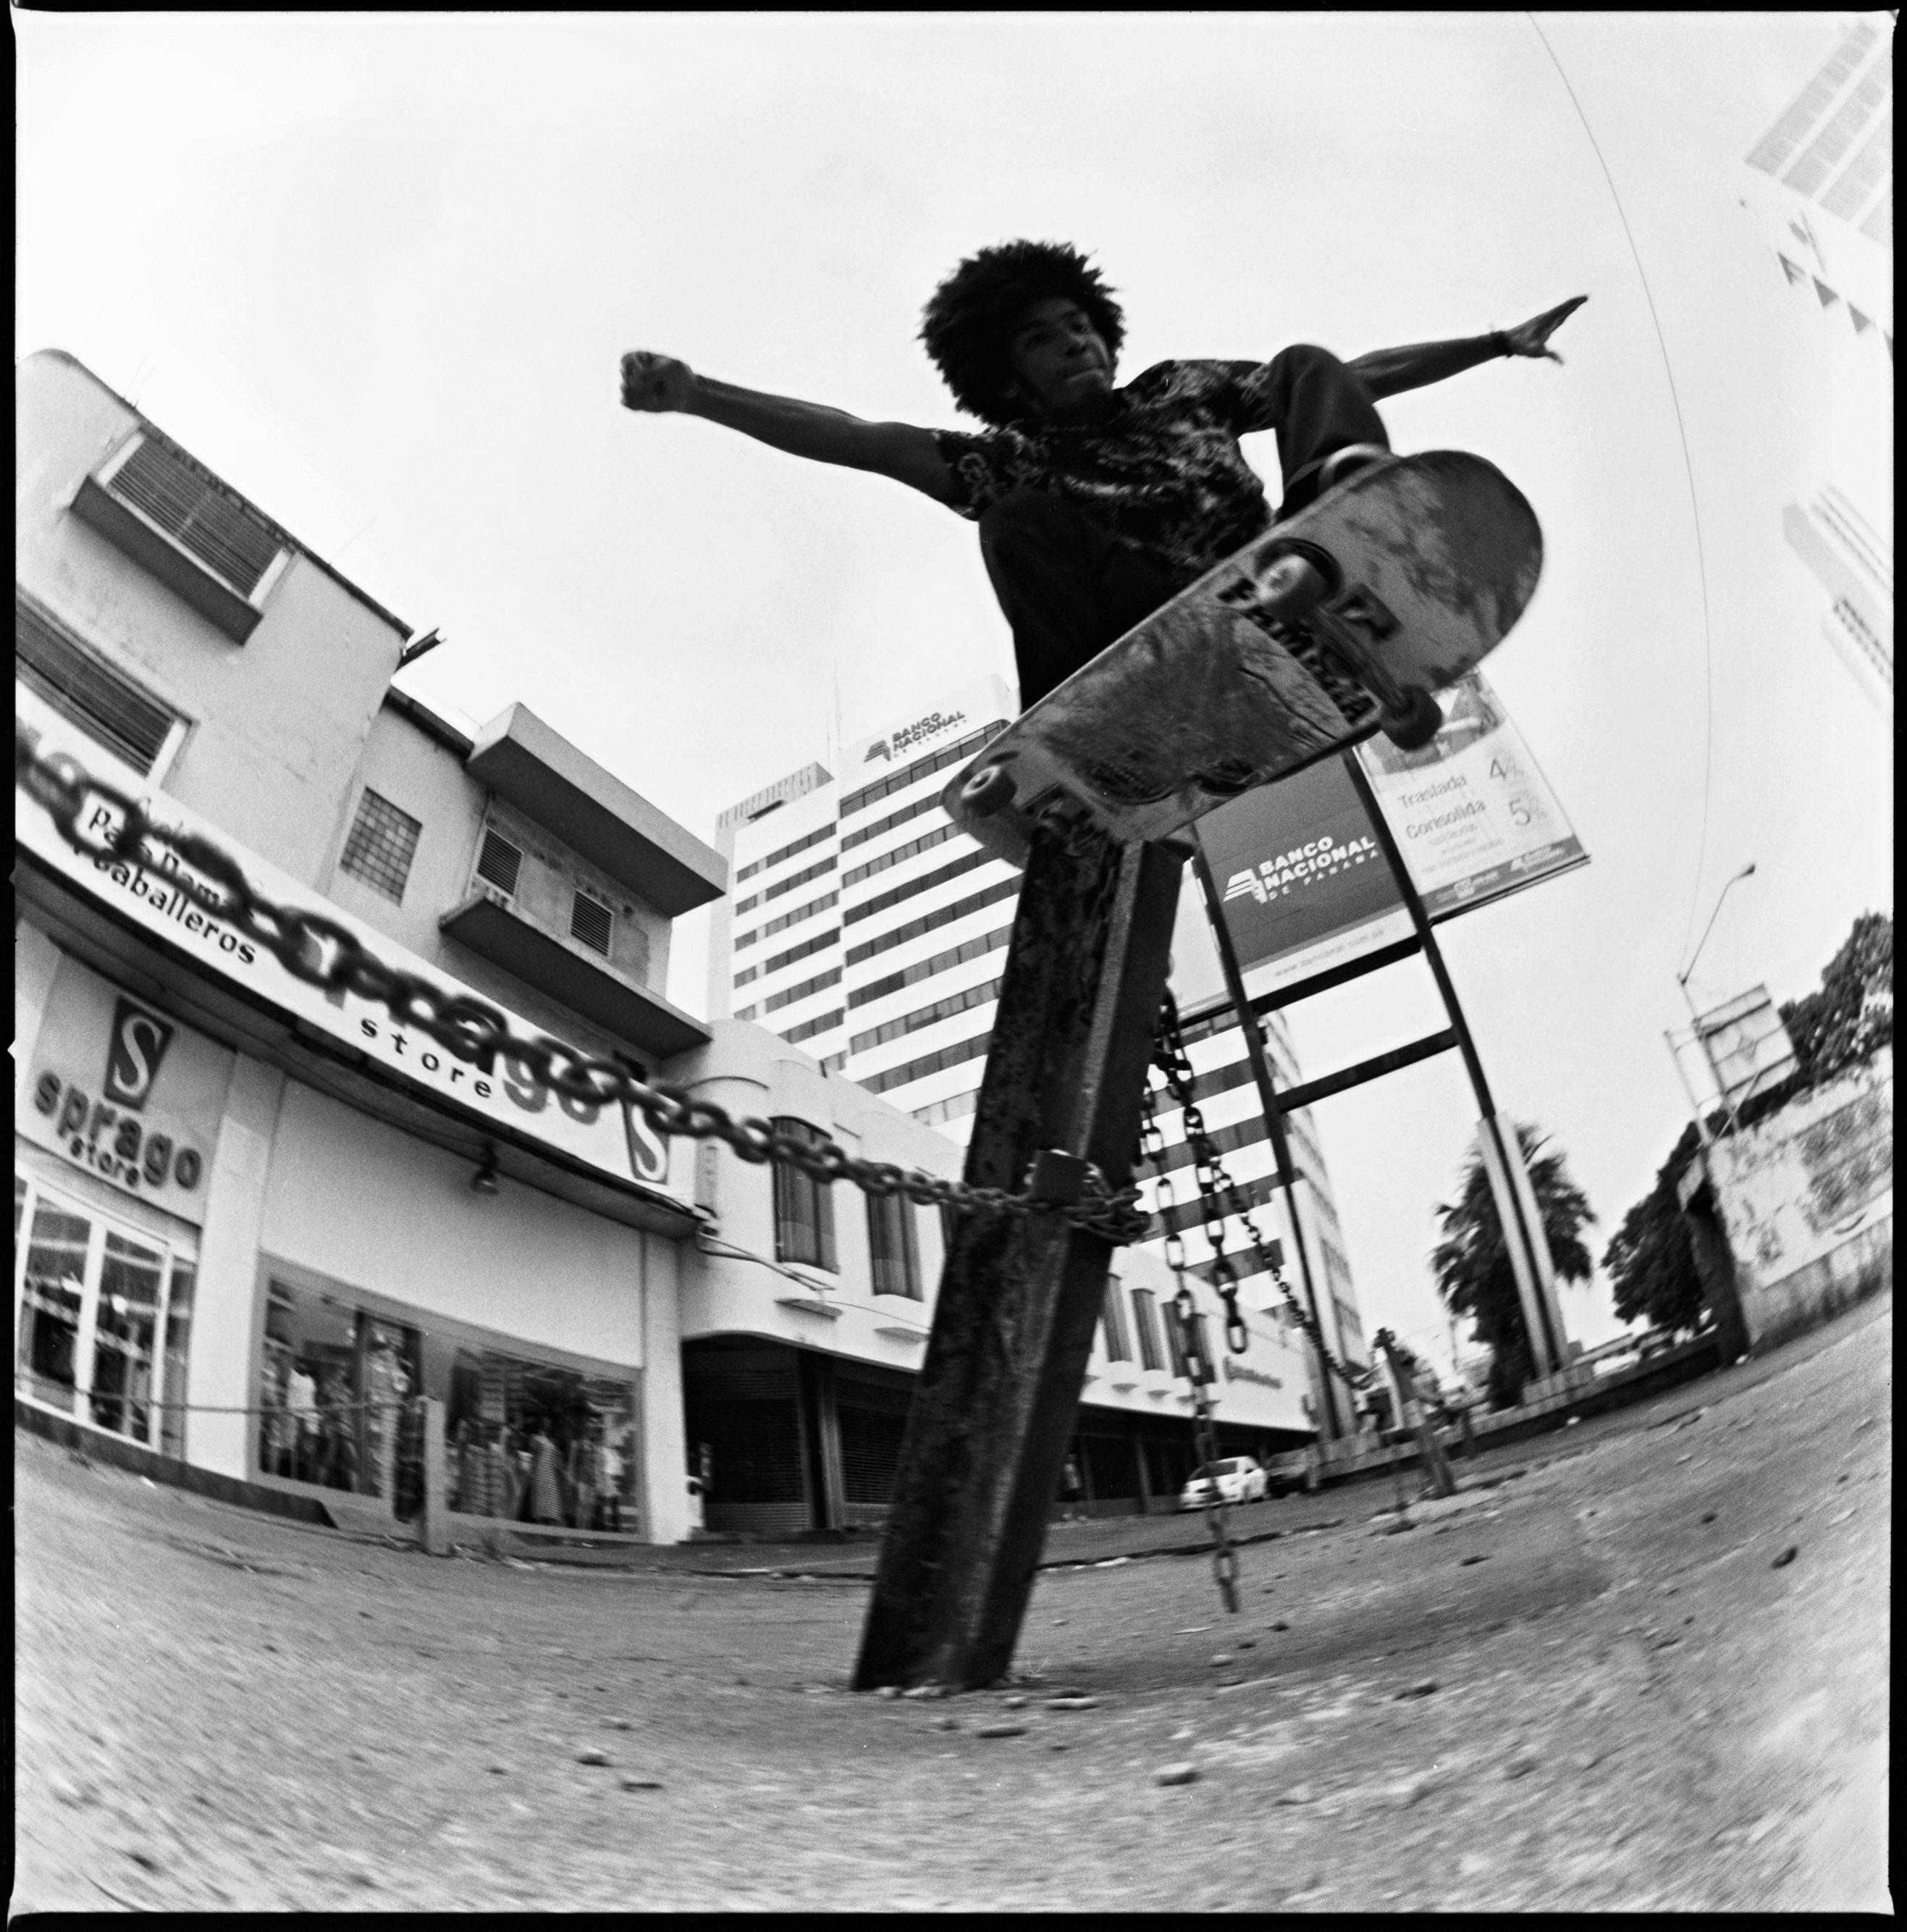 Rafael Gonzalez 09 - Saul Silgado - Polejam